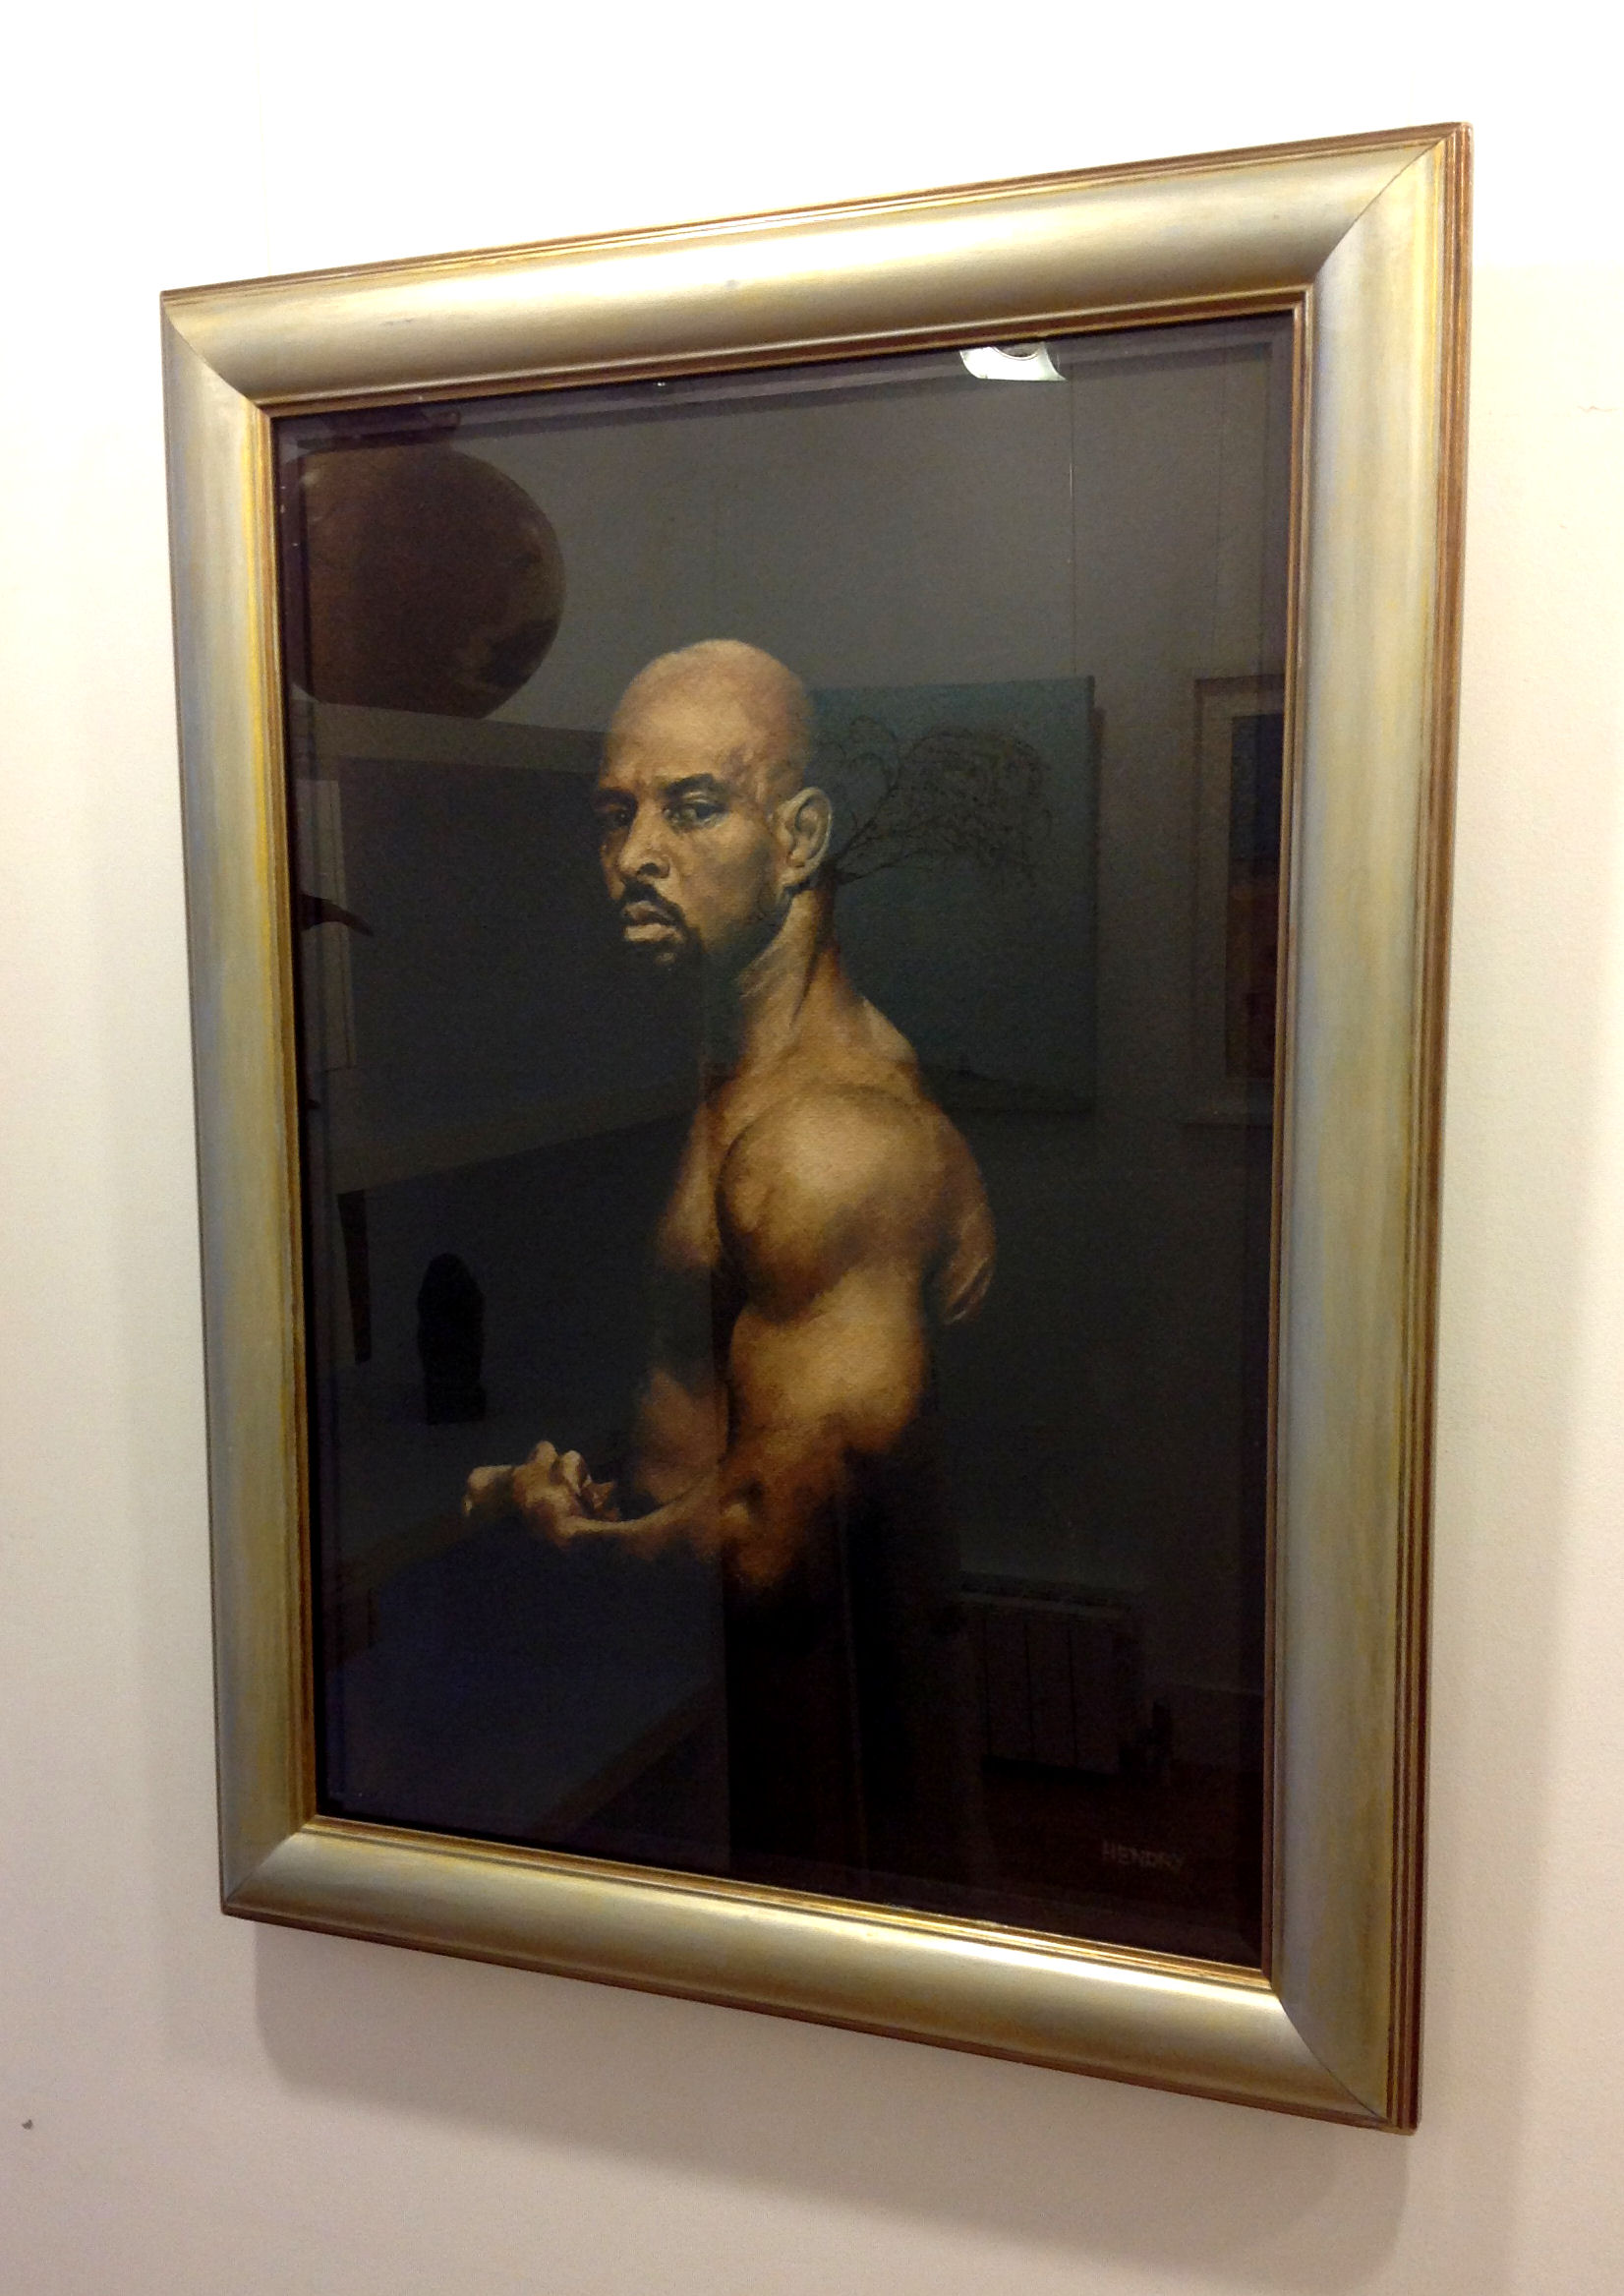 'UFC Boxer' by artist Steve Hendry